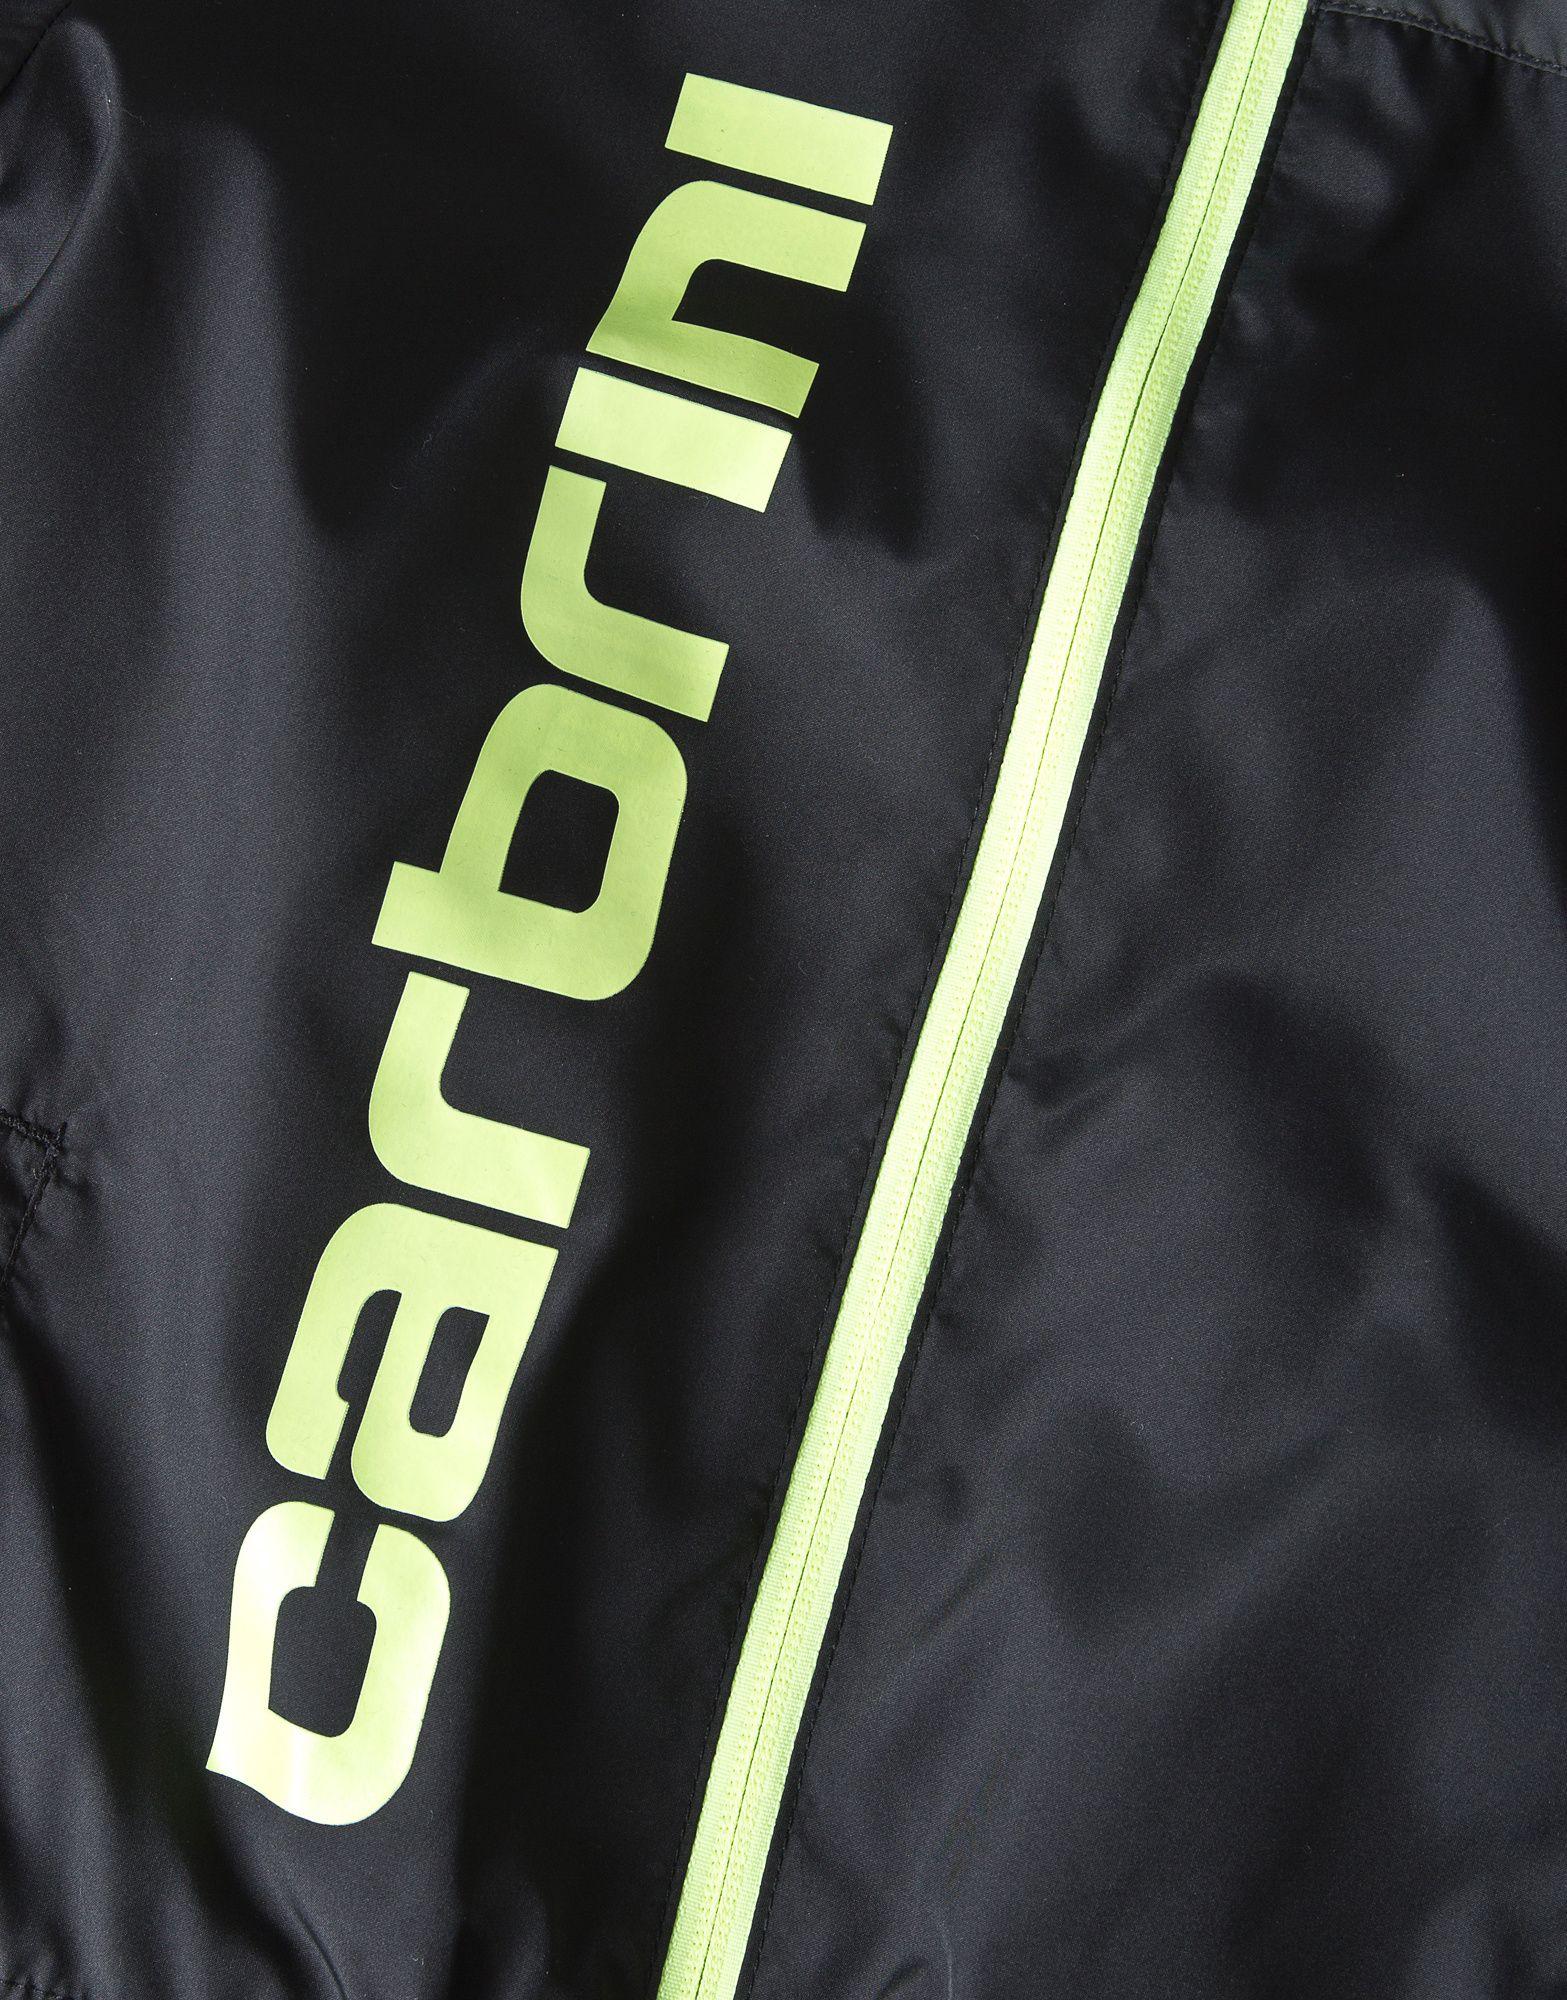 Carbrini Cade Woven Suit Childrens